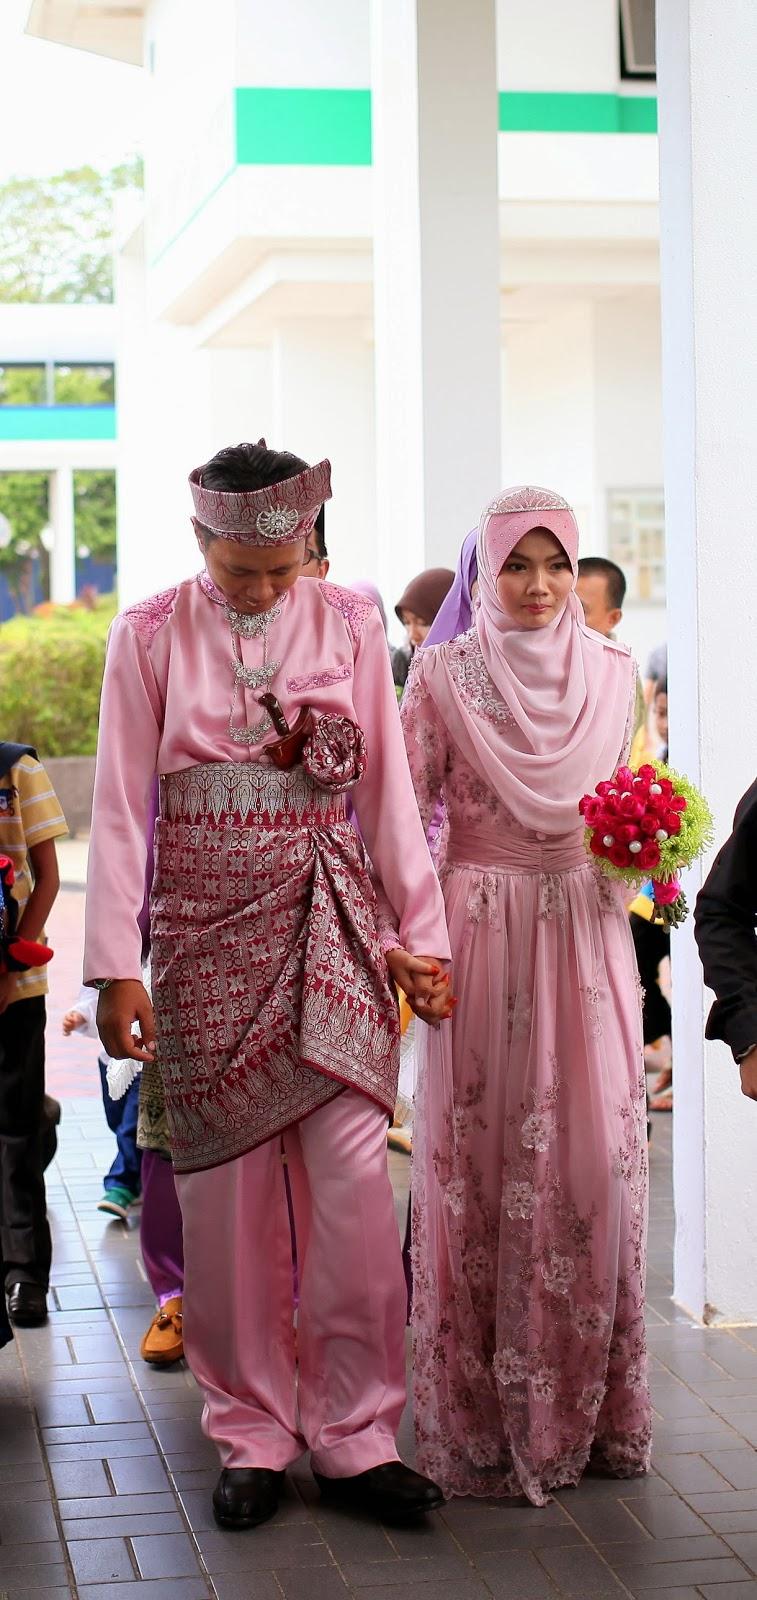 Affordable islamic wedding dress for rent rent my for Wedding dress rental hawaii